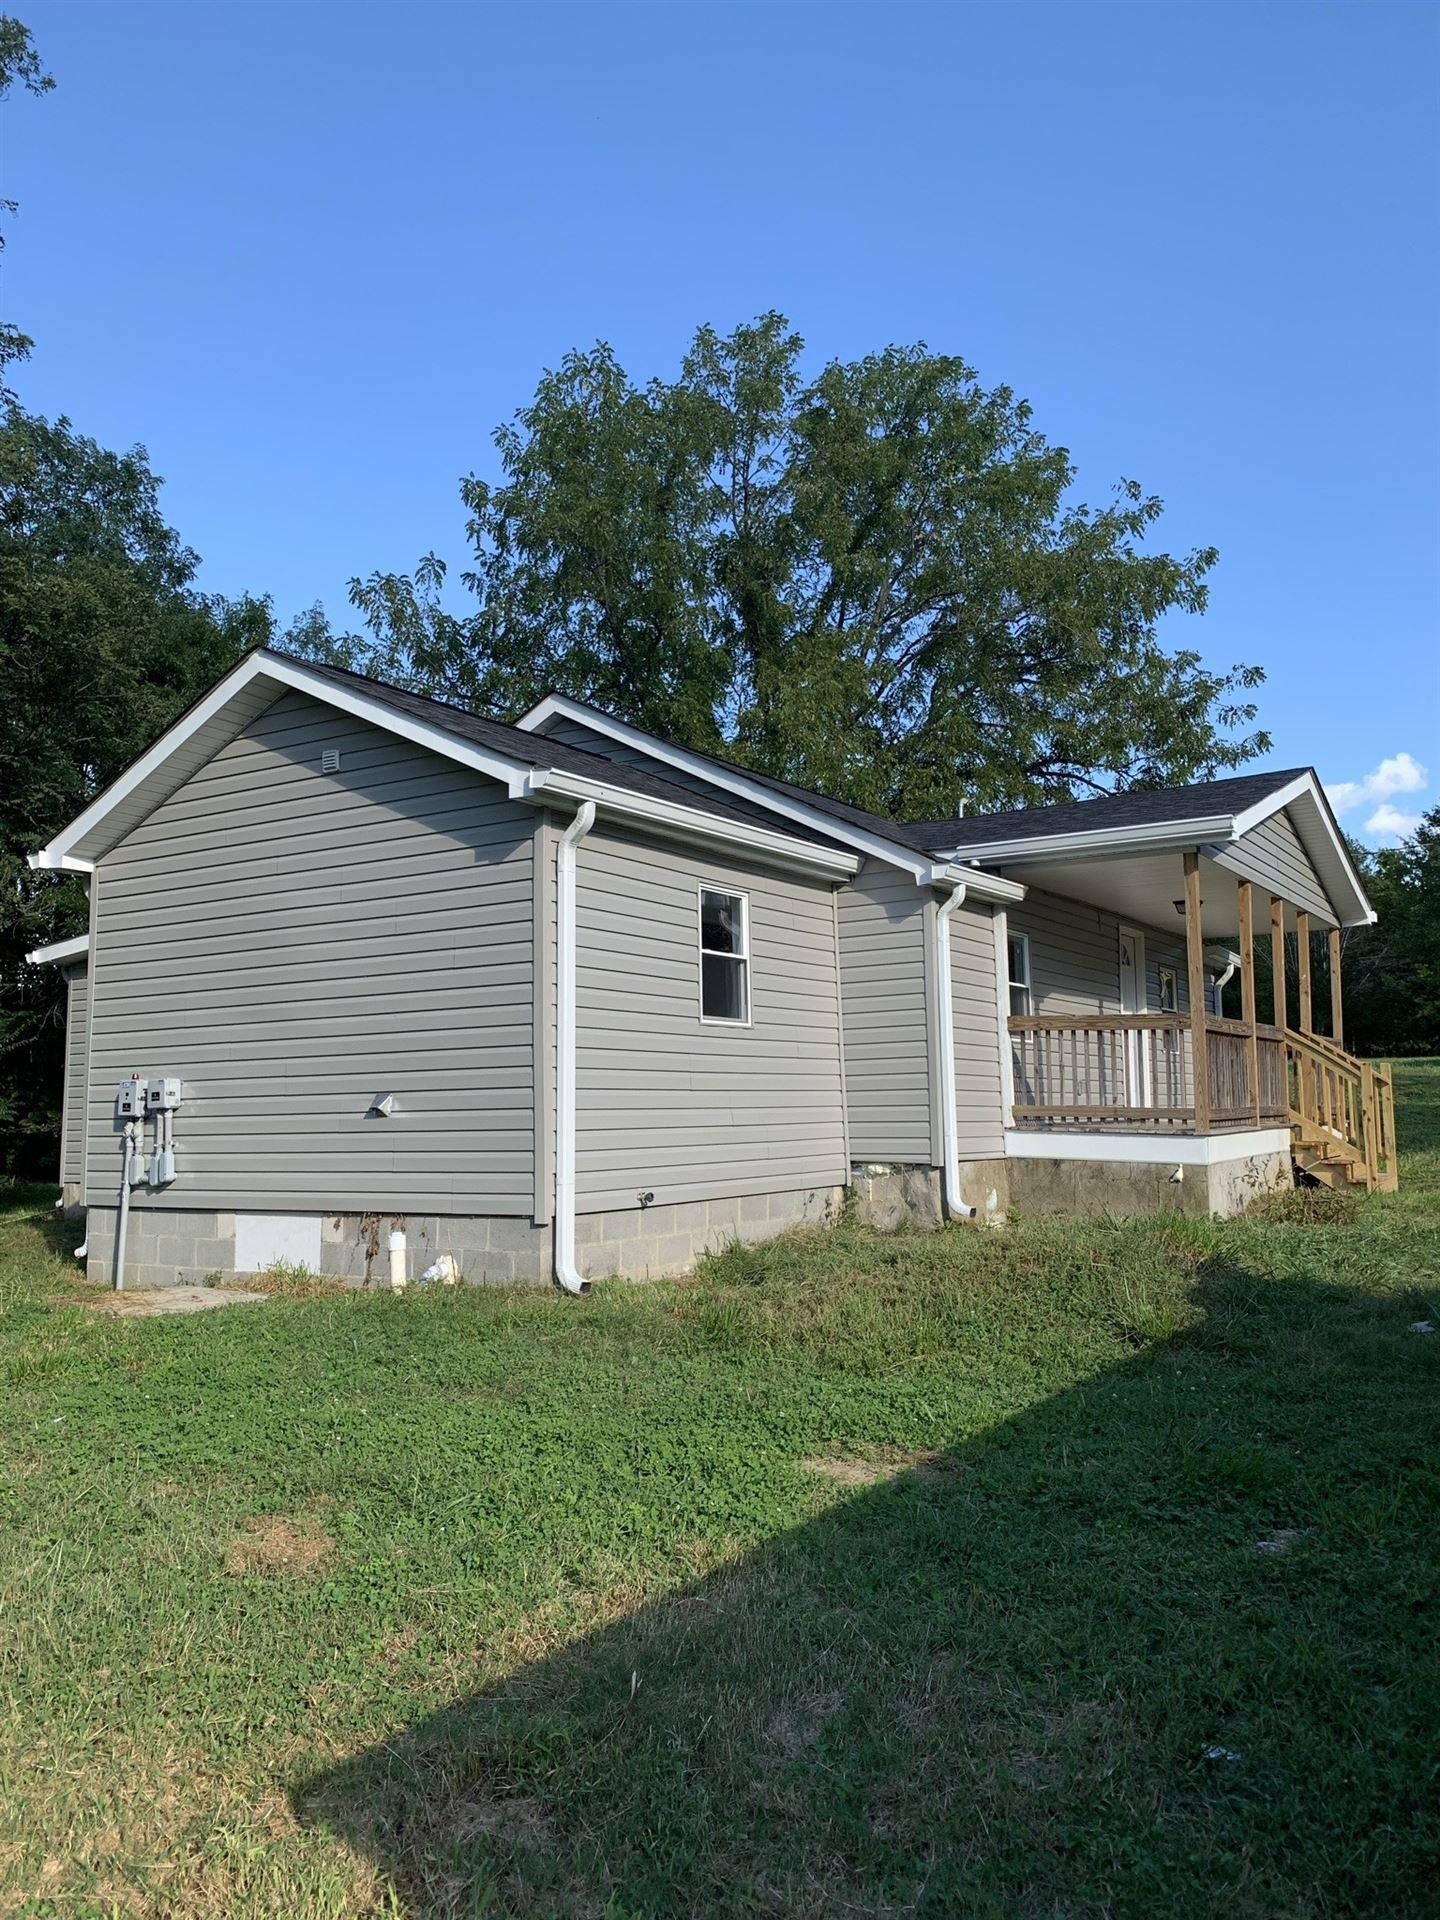 Photo of 5540 Hargrove Ridge Rd, Franklin, TN 37064 (MLS # 2289742)